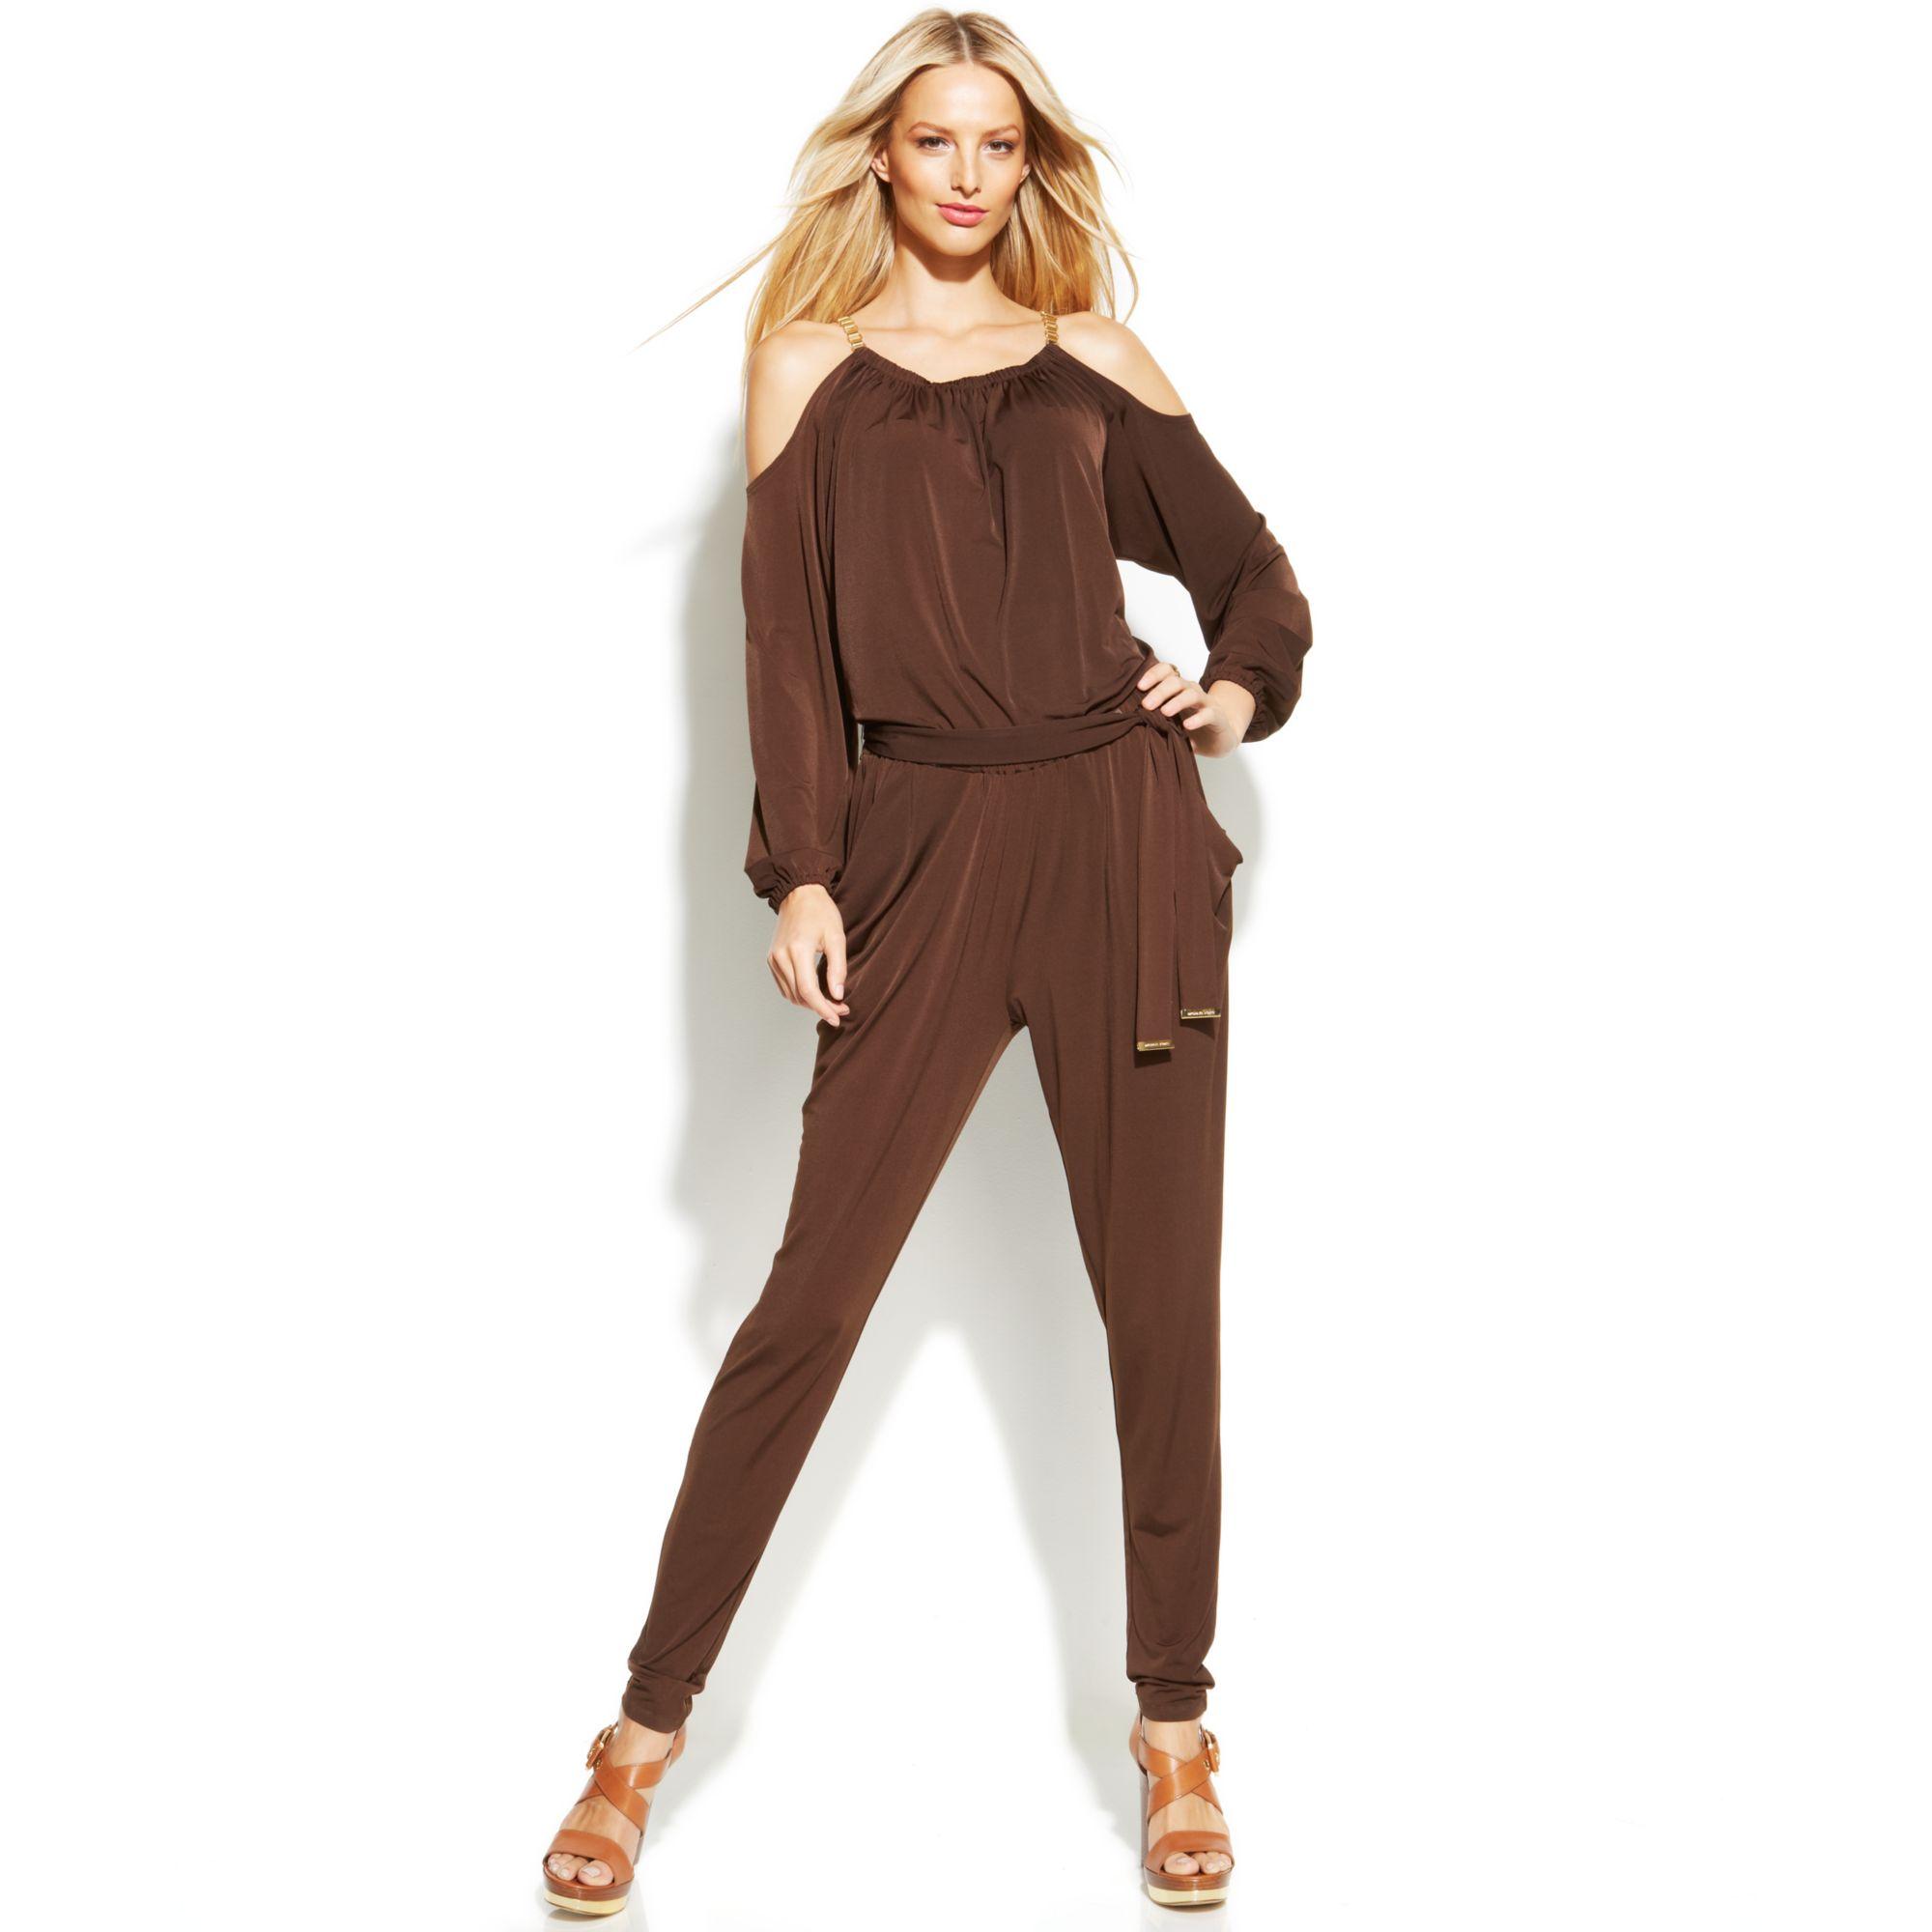 michael kors michael coldshoulder chainstrap jumpsuit in brown lyst. Black Bedroom Furniture Sets. Home Design Ideas